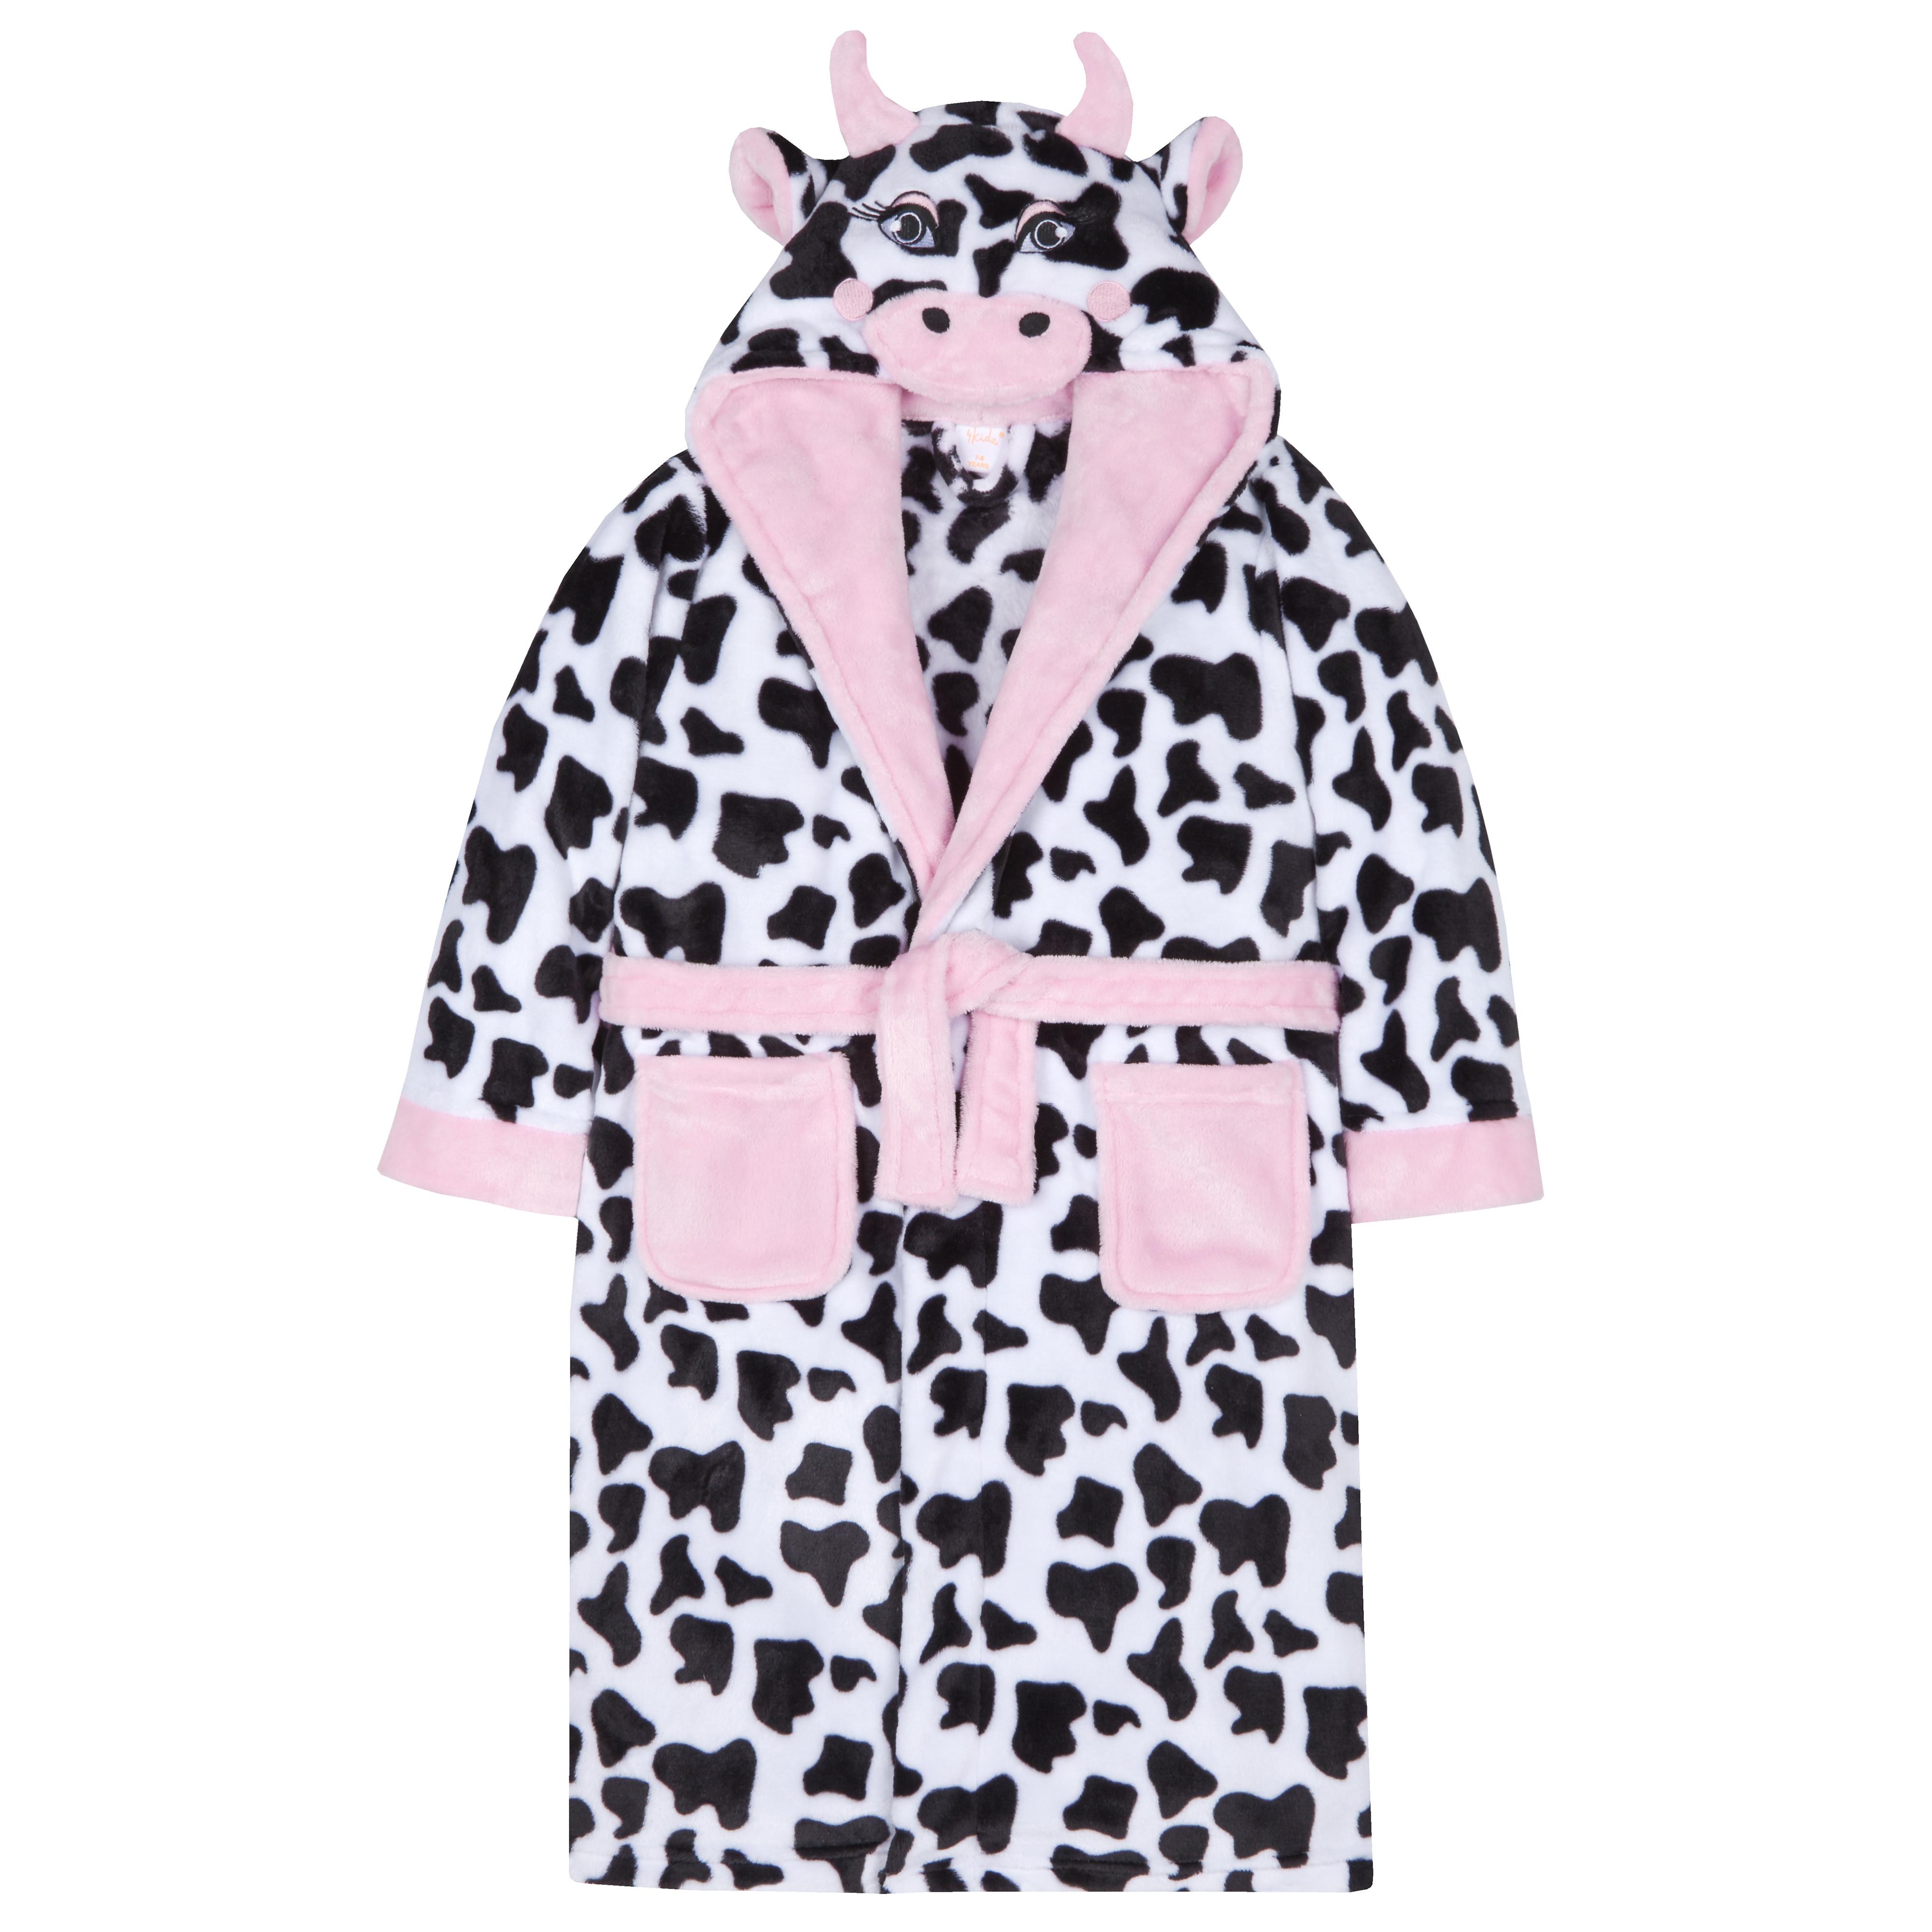 4Kidz Girls Dalmatian Print Dressing Gown with Hood /& Face